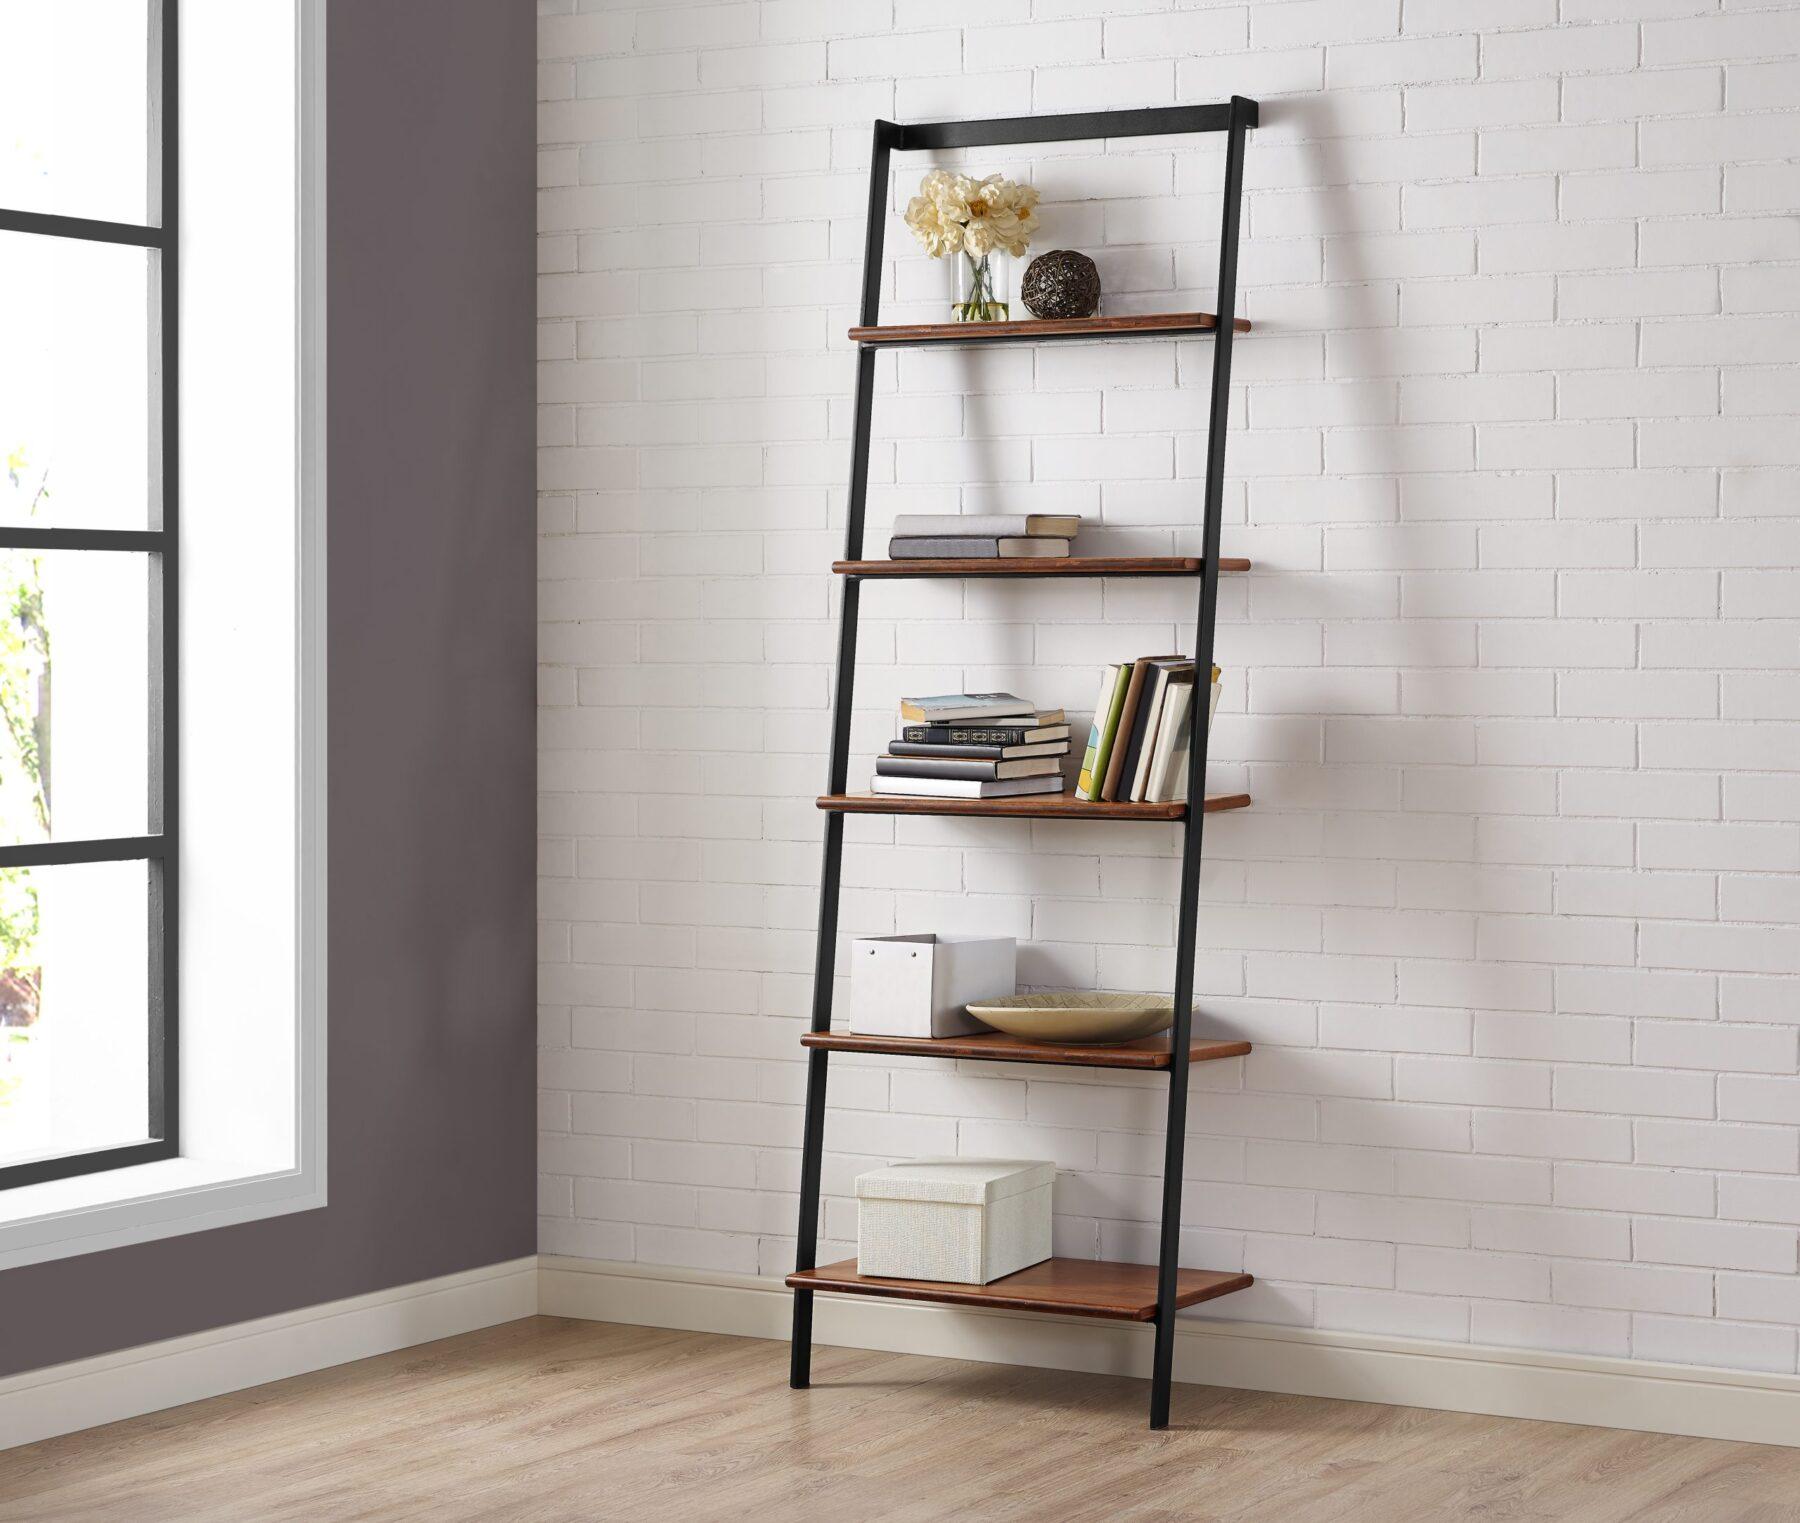 GS003E Leaning Shelf Lifestyle